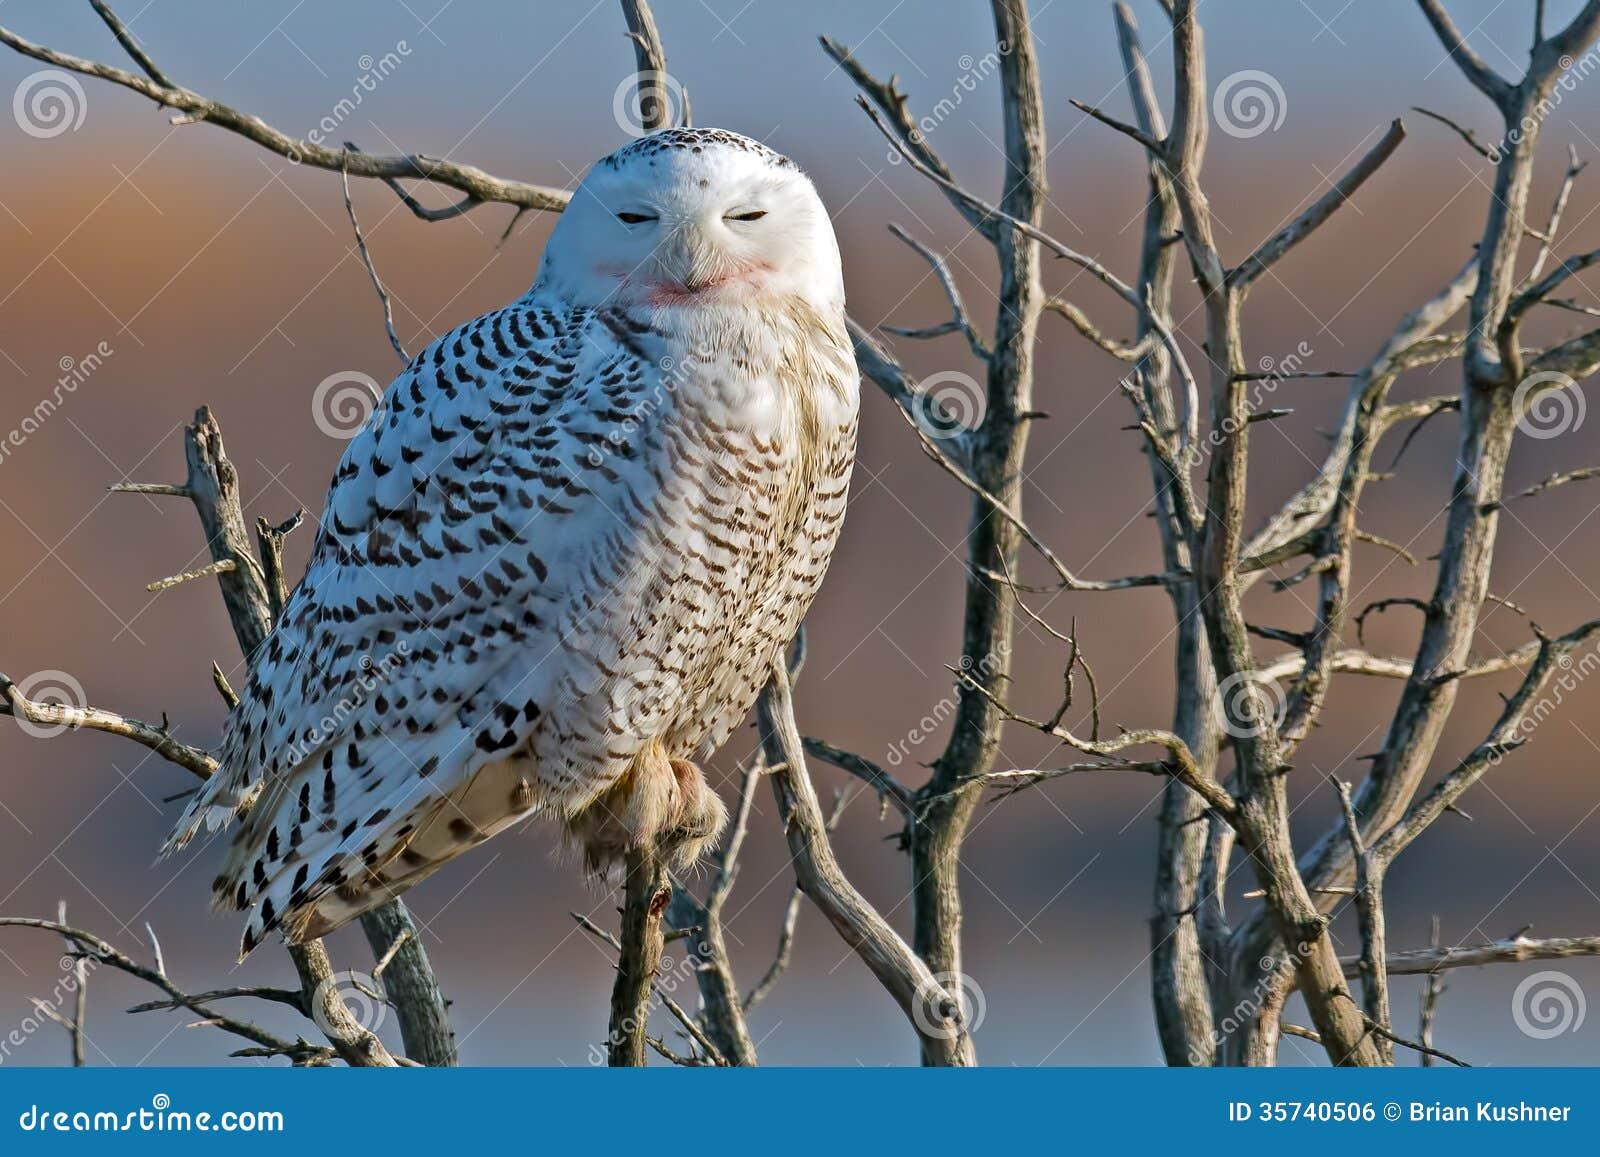 Snowy Owl Royalty Free Stock Image Image 35740506